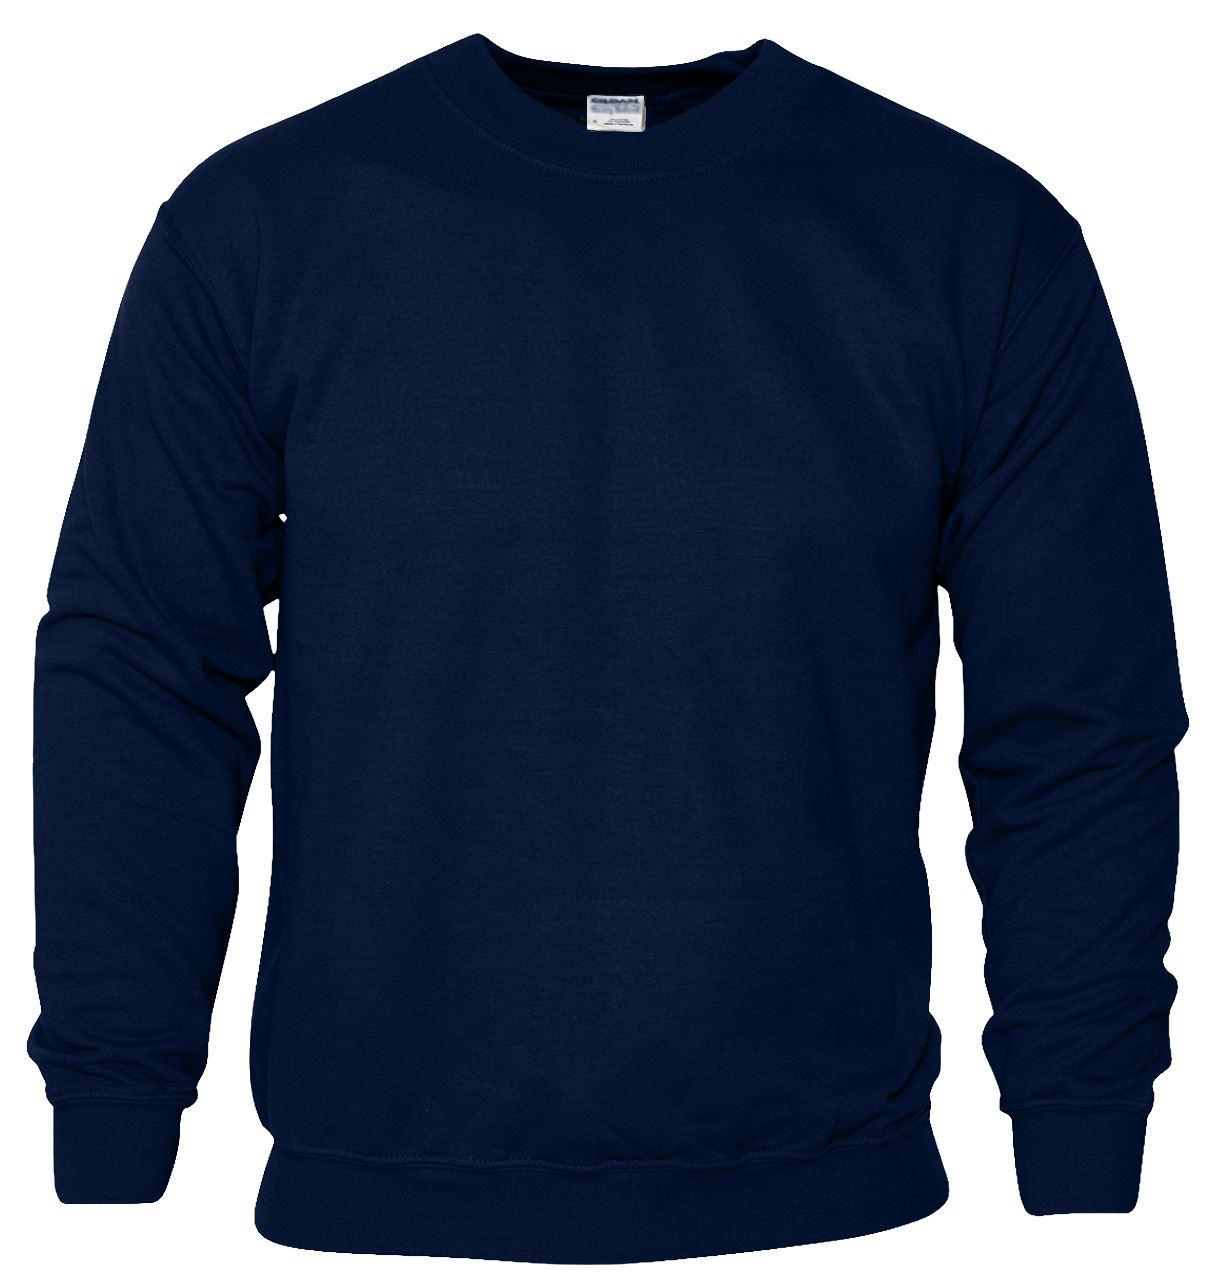 Lord Of The Rings Gildan Sweater